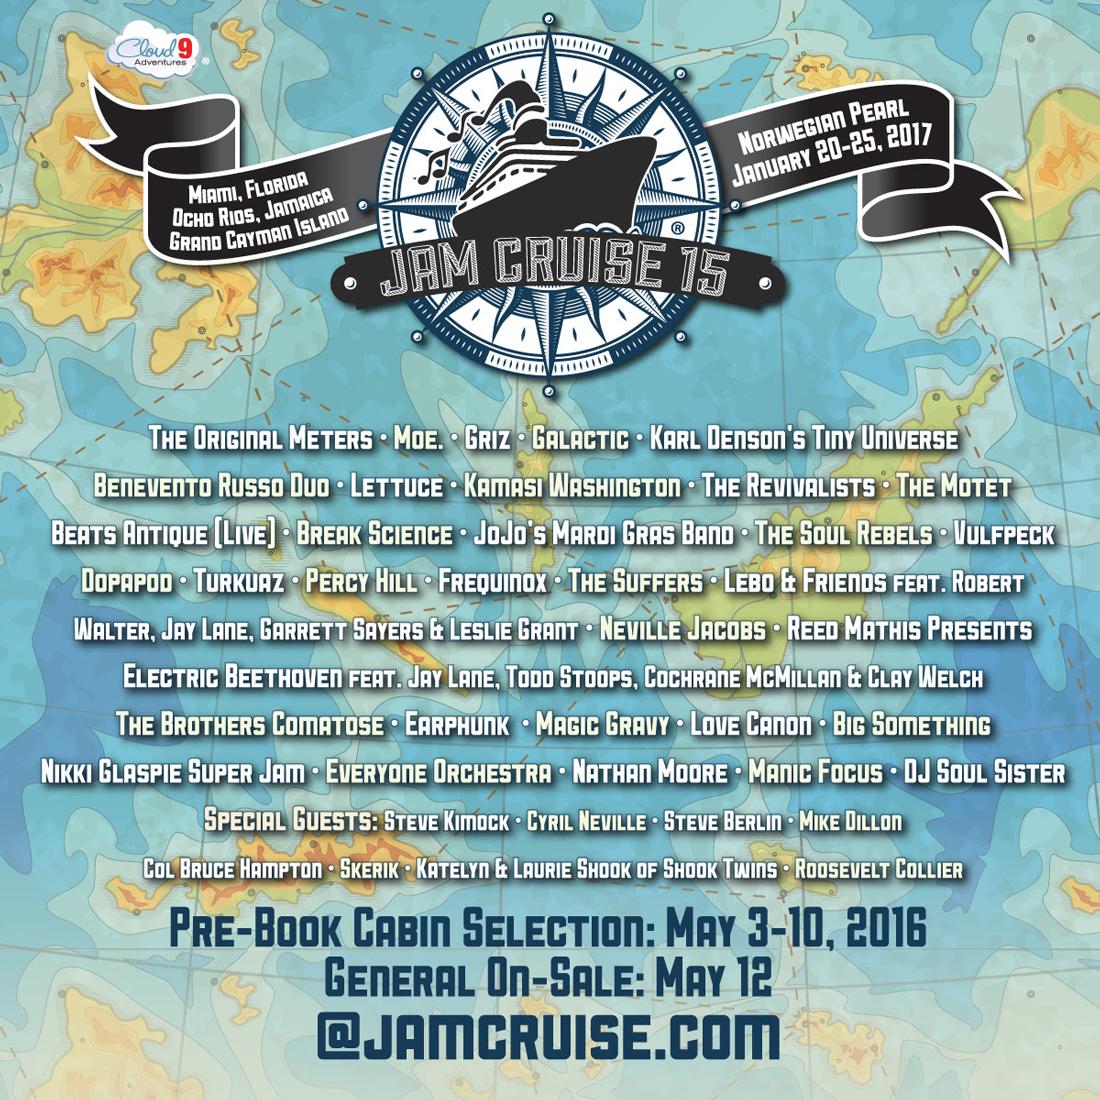 Jam Cruise 15 Lineup. Photo by: Jam Cruise